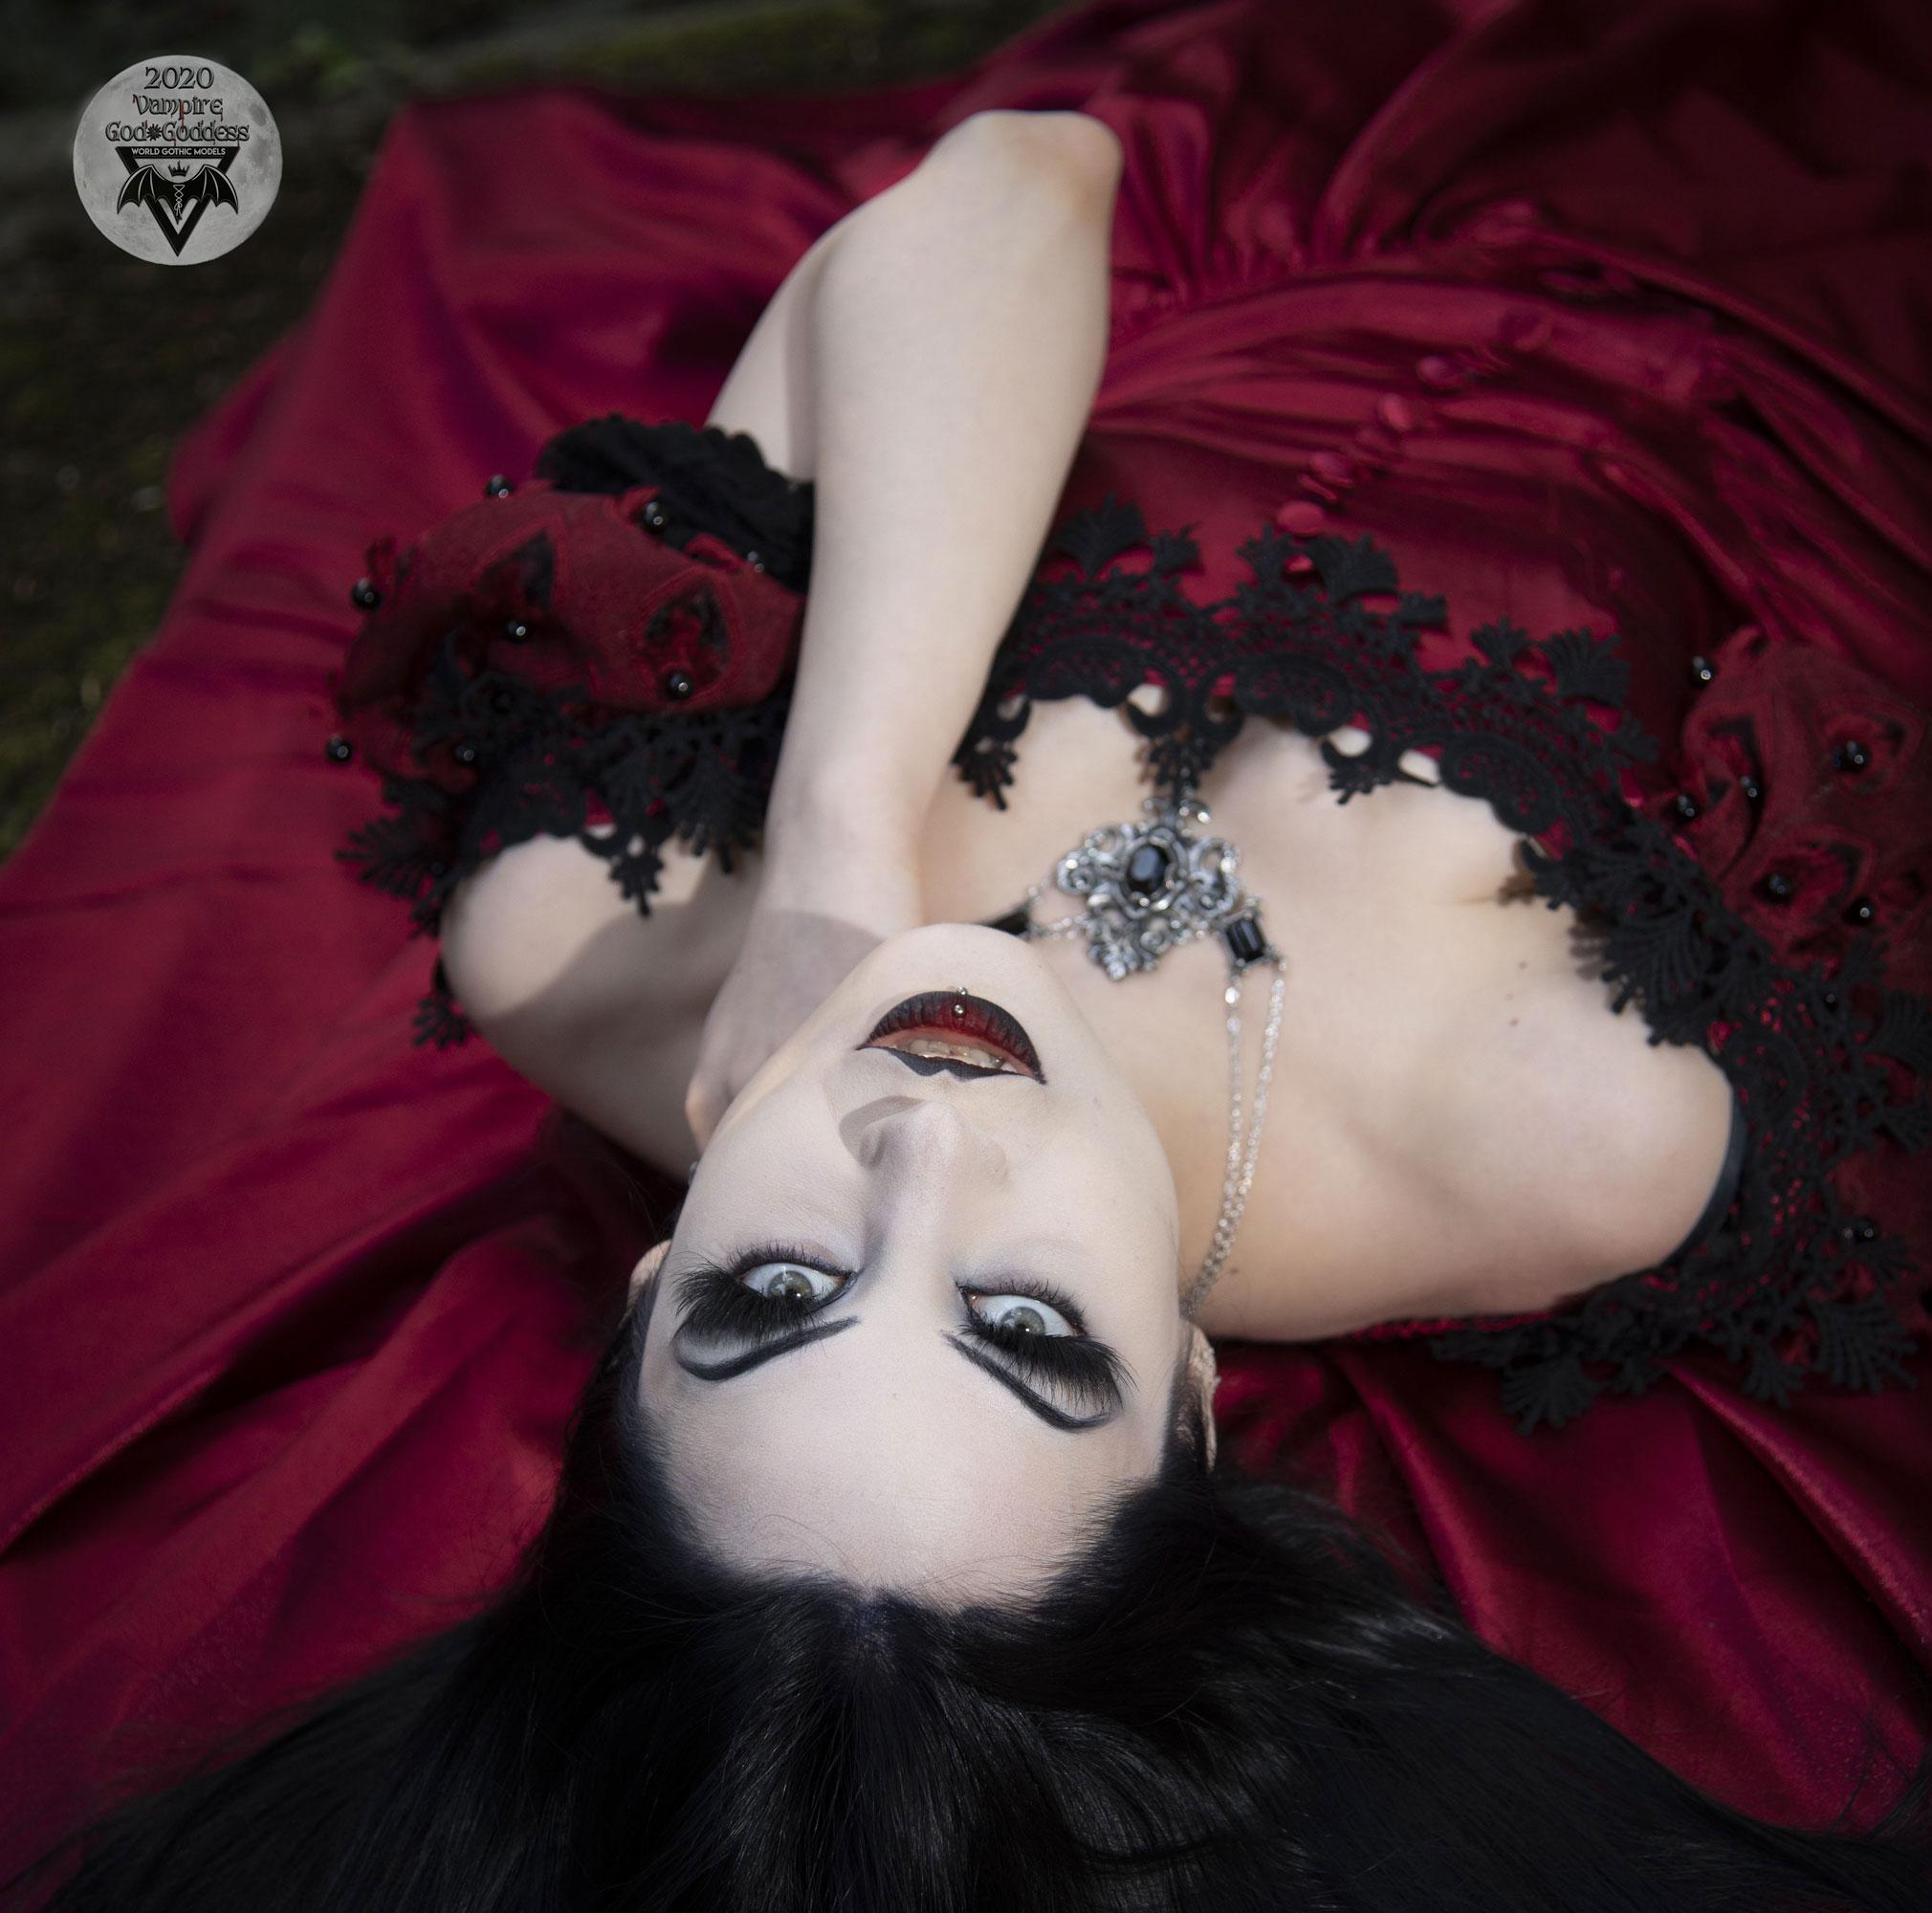 44. Lilith Vampyre, UK